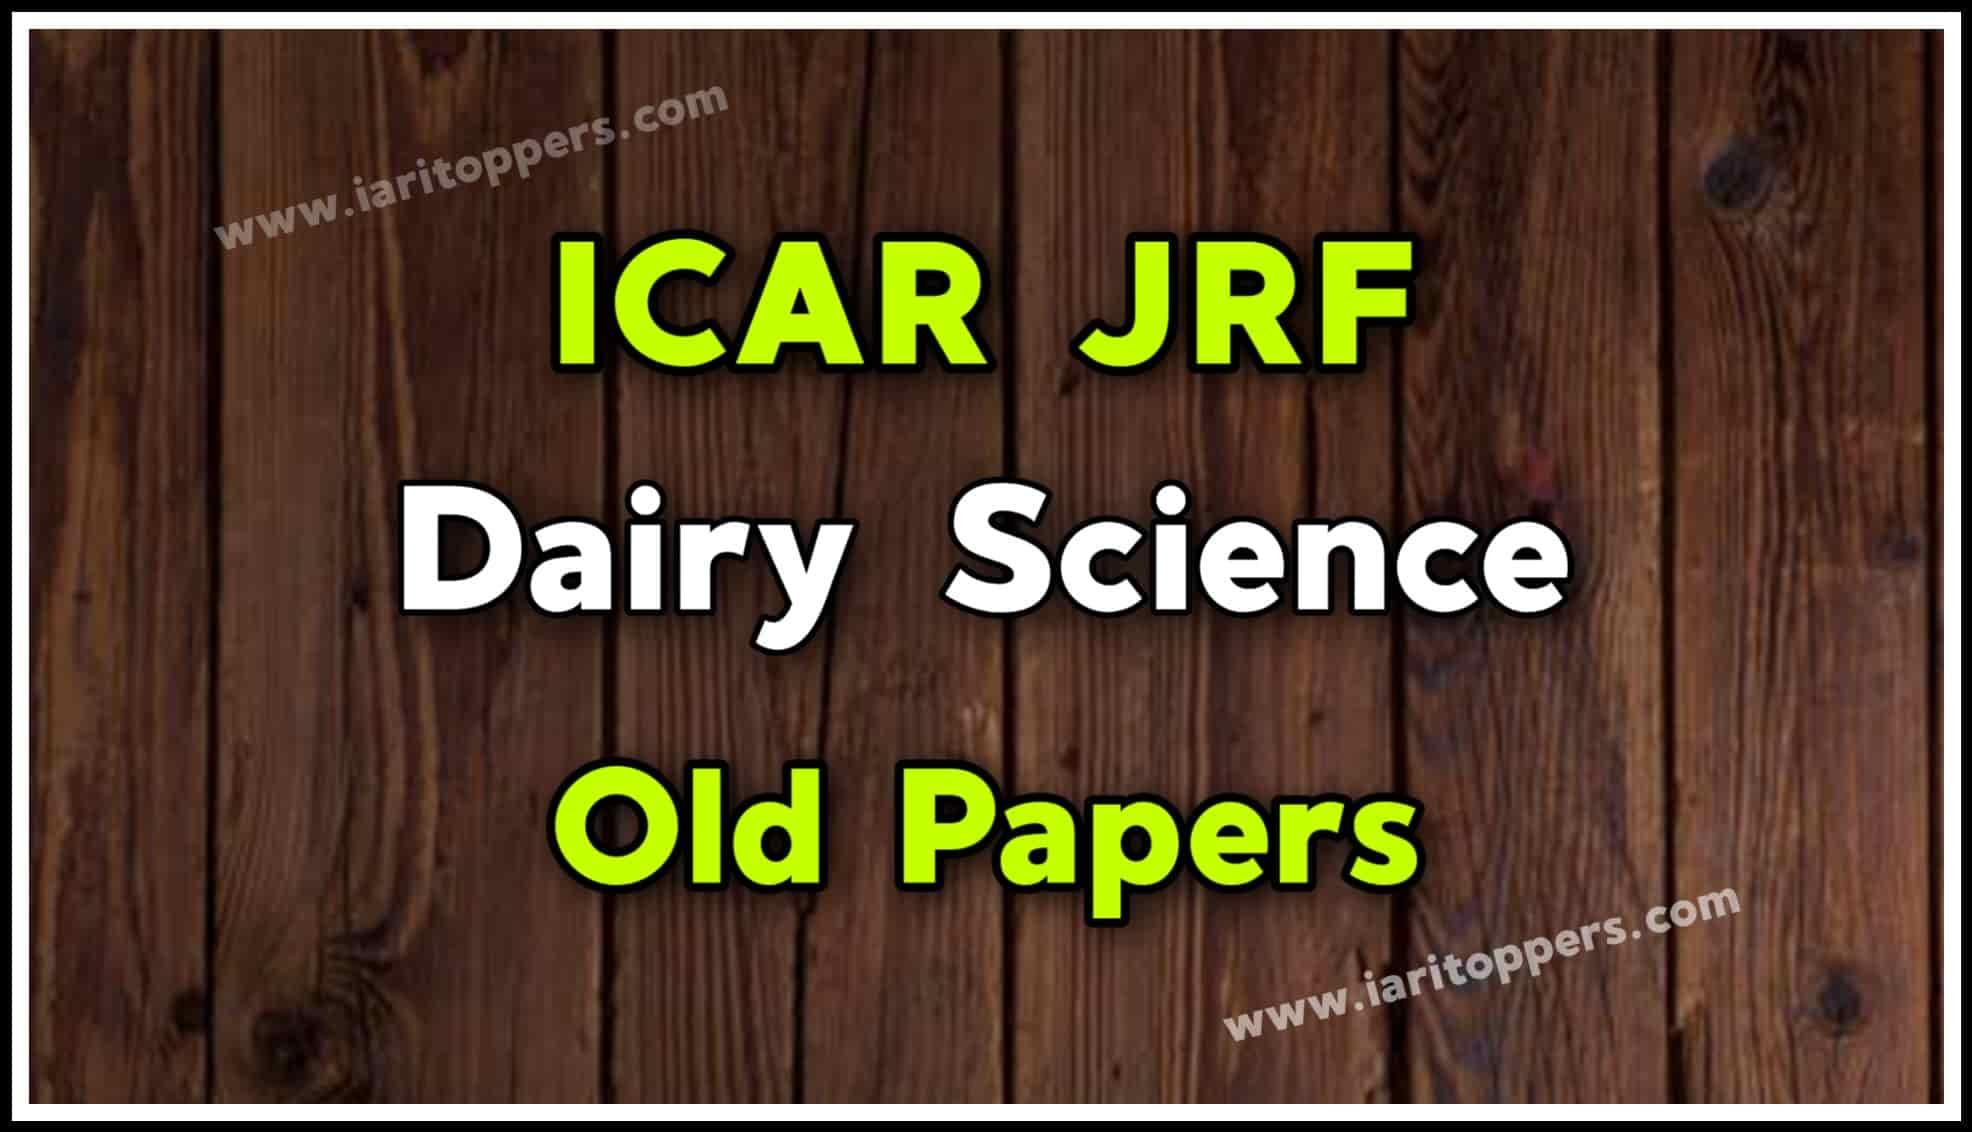 ICAR JRF Dairy Science Old Papers PDF Download